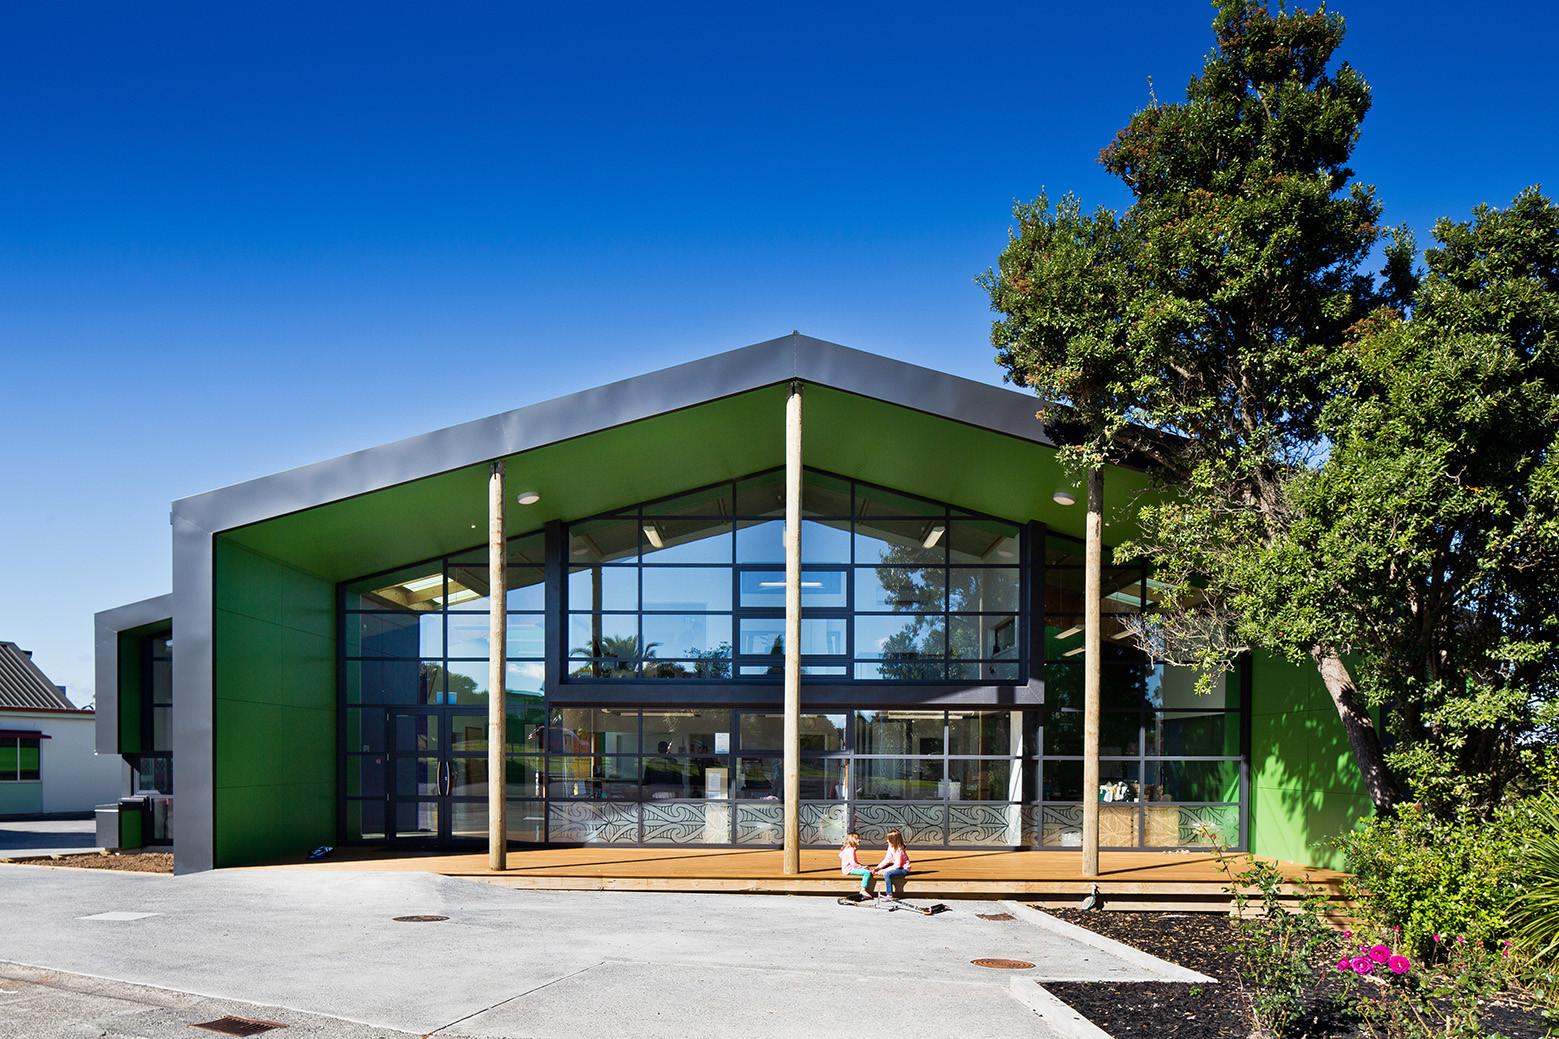 Clayton Park School Hall and Administration / Stephenson&Turner, © Paul McCredie